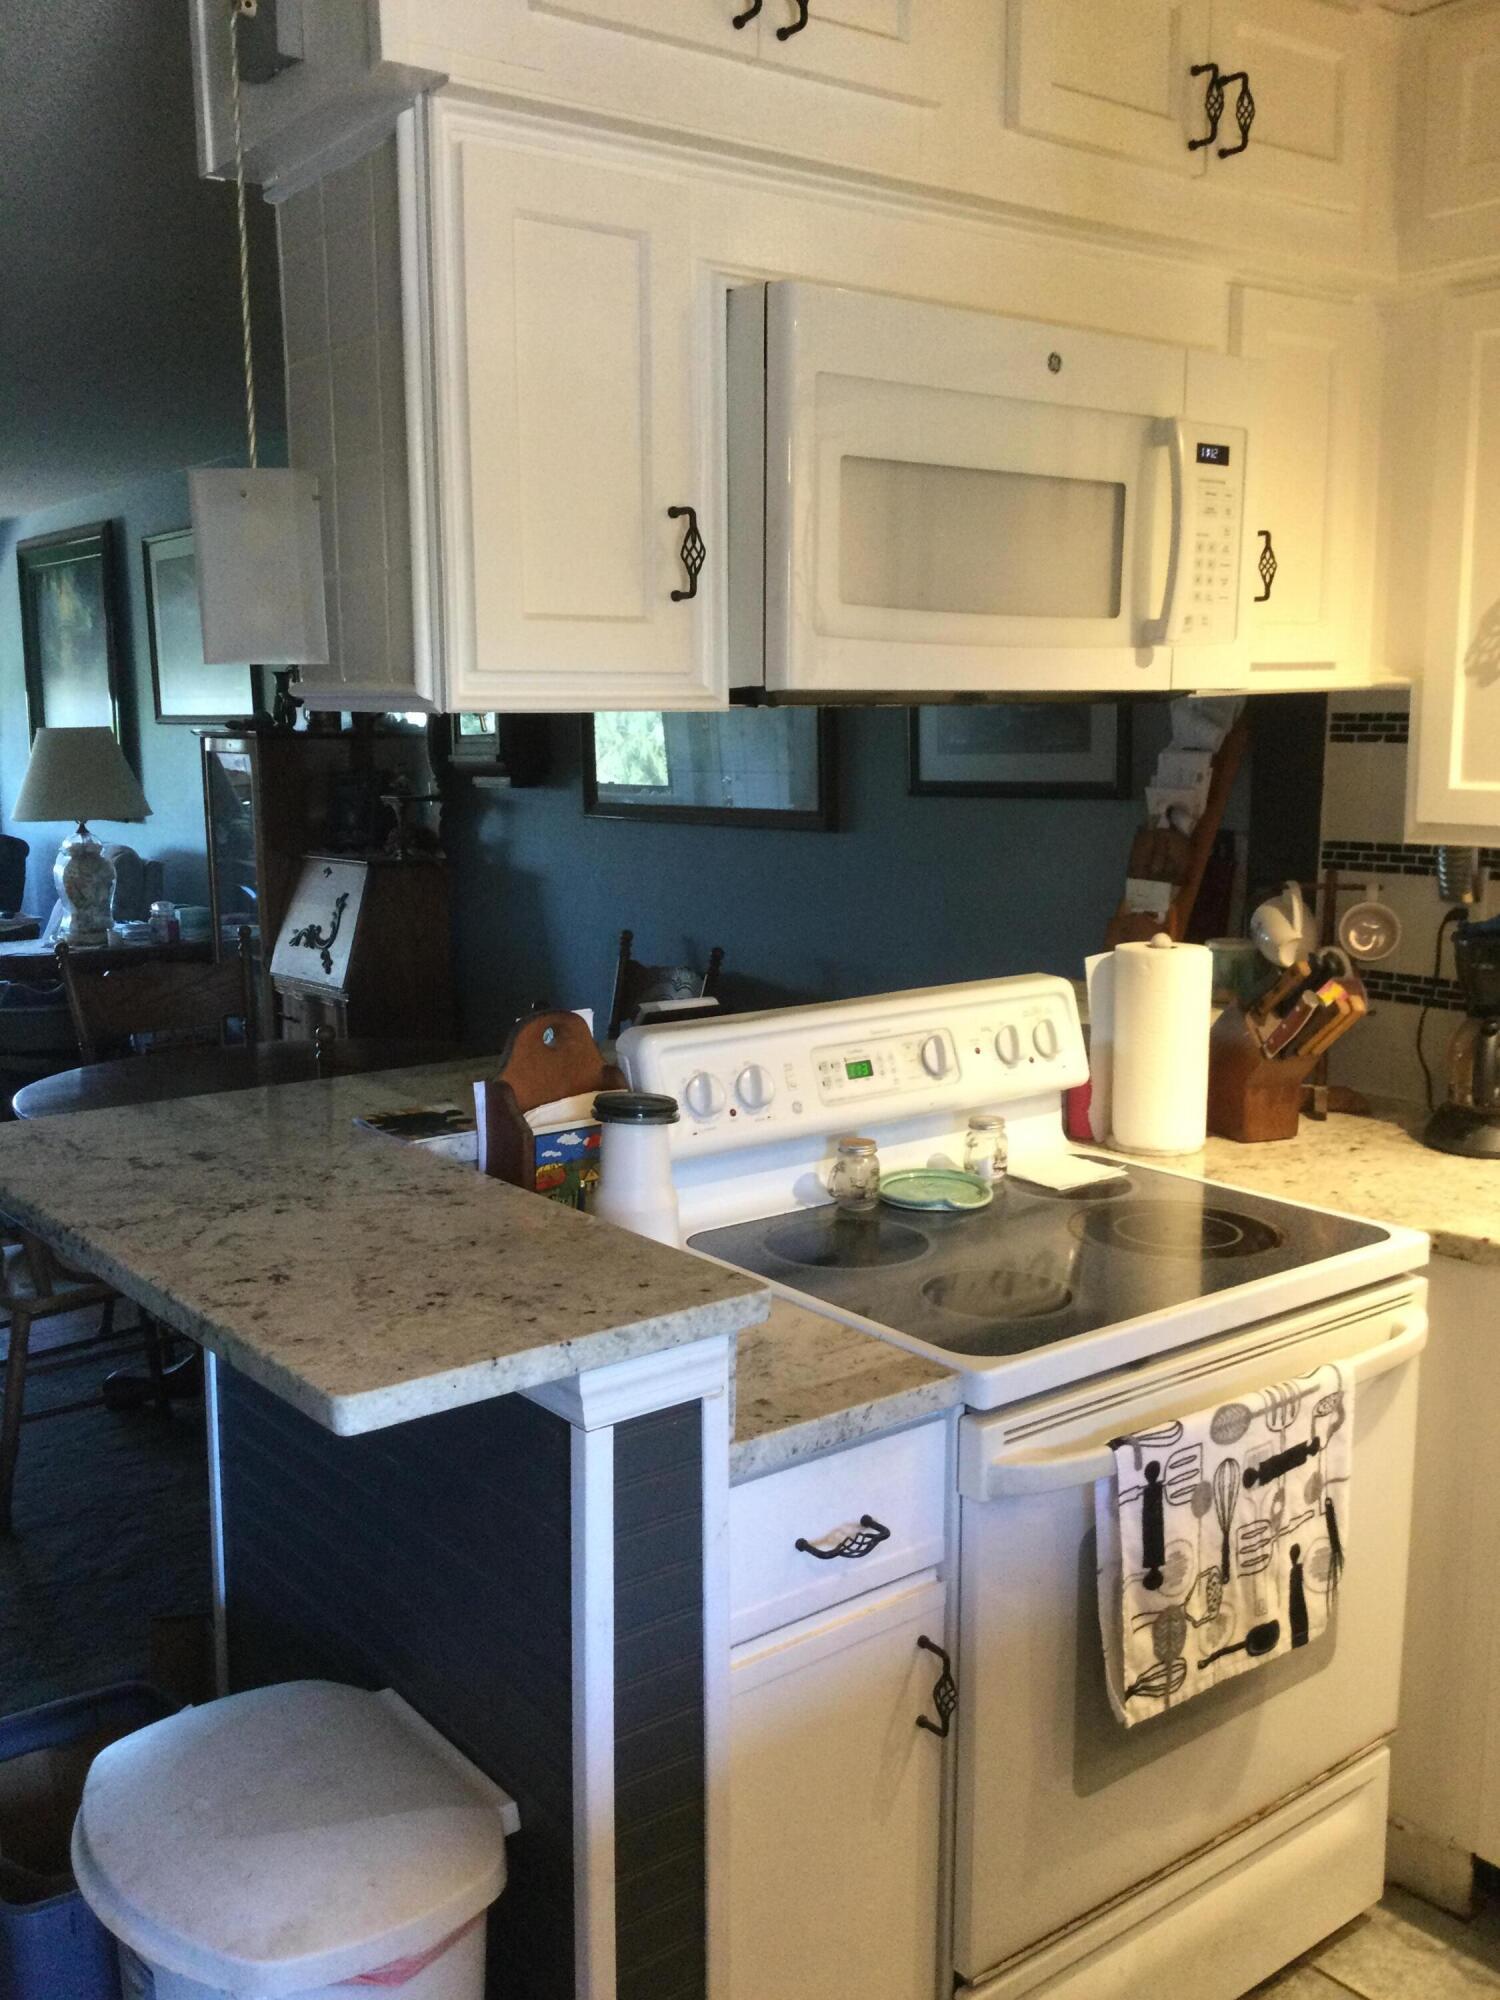 Marshview Villas Homes For Sale - 124 Mariners Cay, Folly Beach, SC - 9